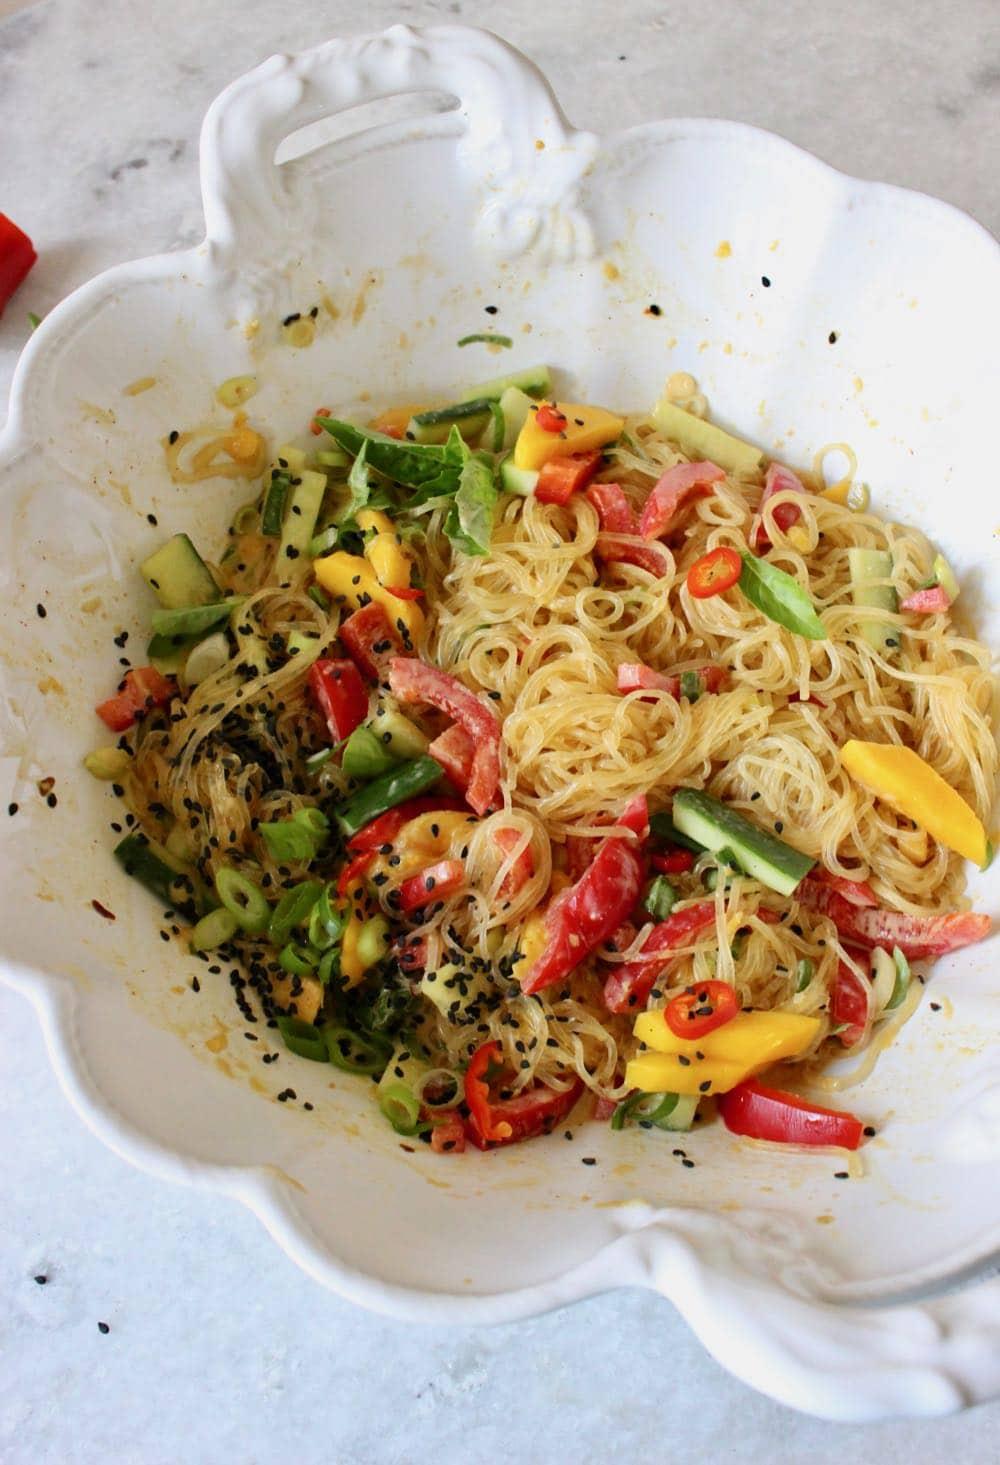 Kelp noodle salad recipe with spicy peanut sauce, tropical fresh mango and crunchy veggies.